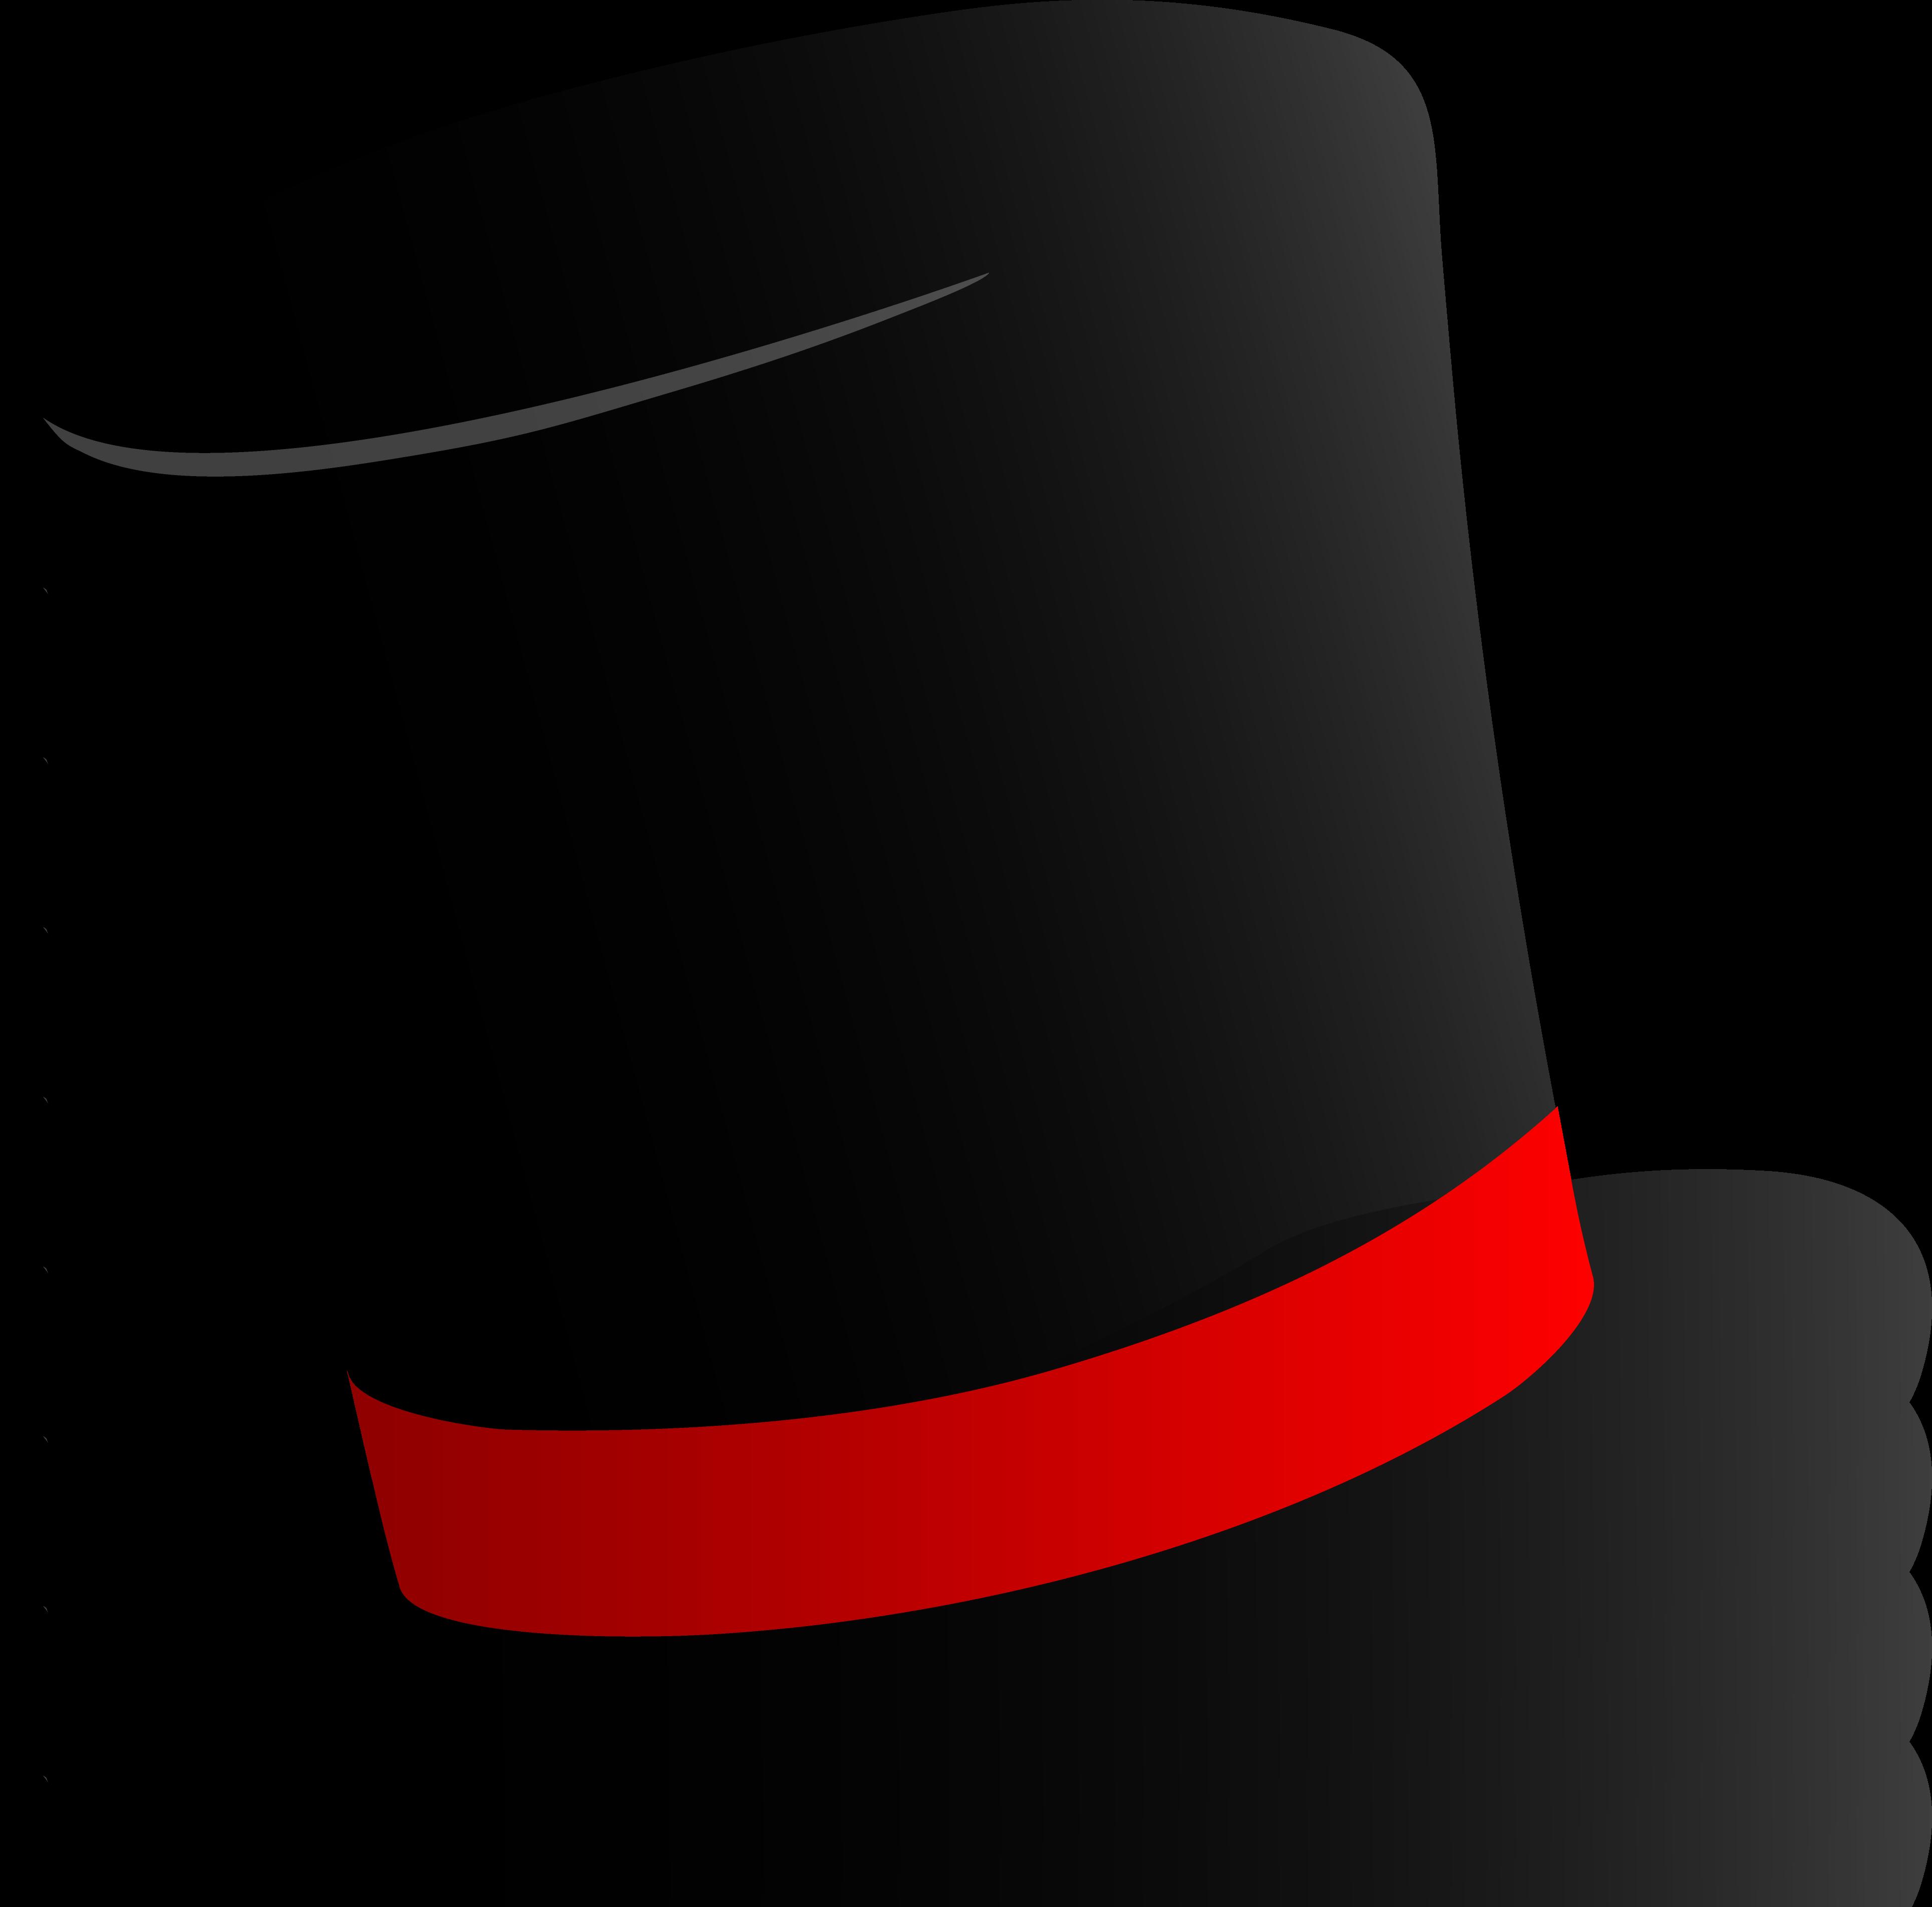 Free Top Hat Clipart, Download Free Clip Art, Free Clip Art.